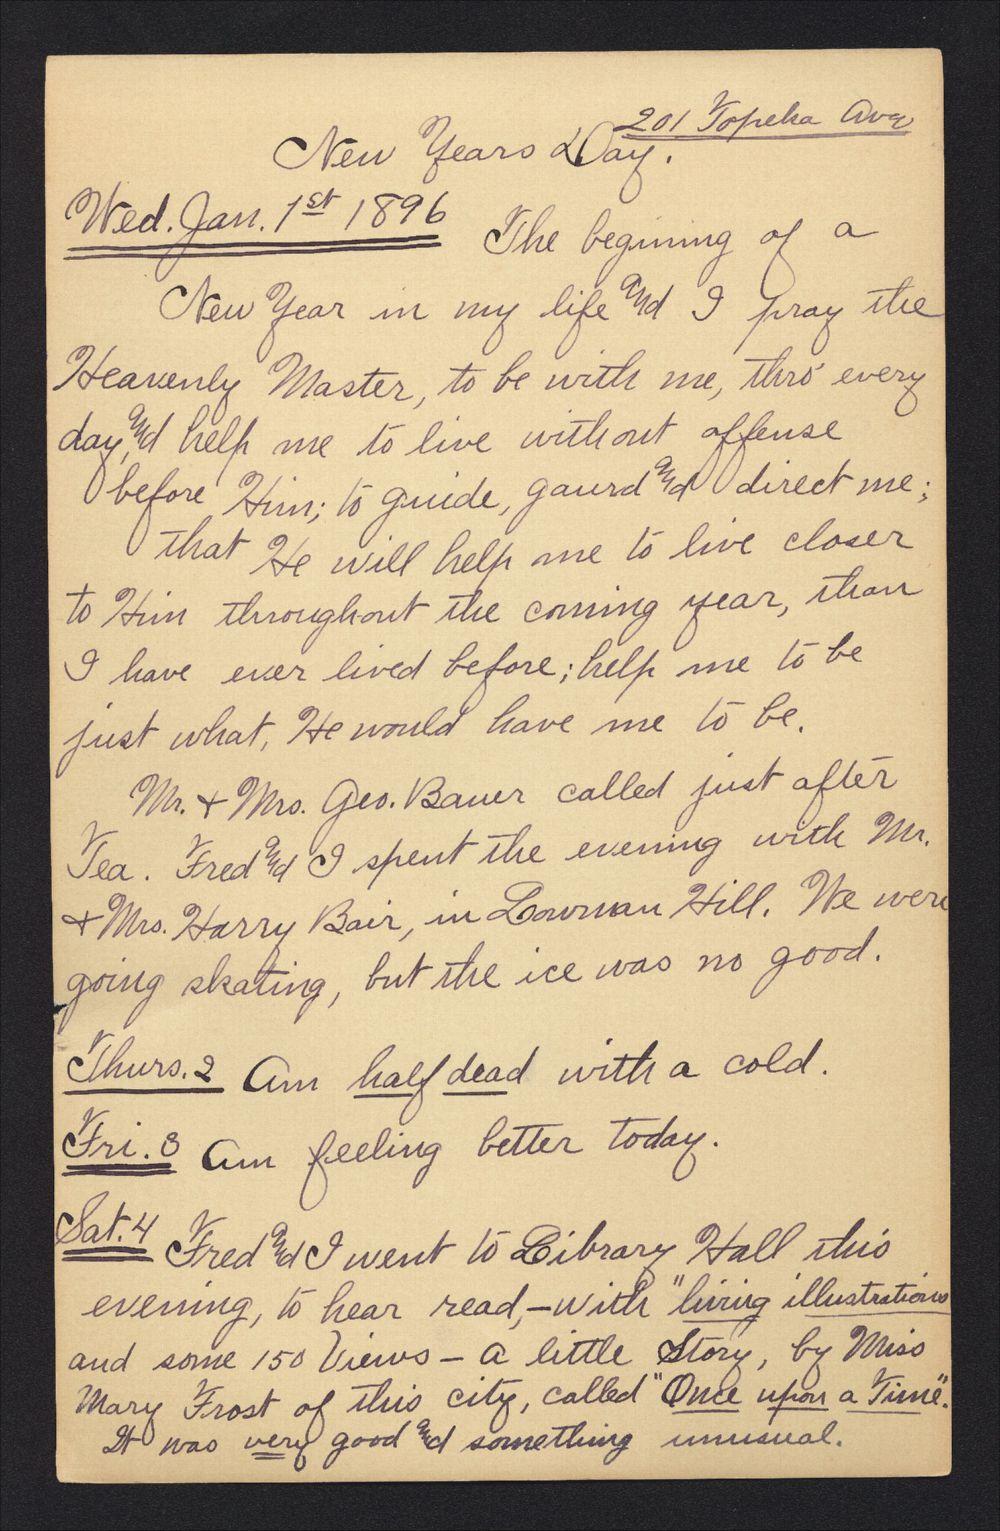 Martha Farnsworth diary - Jan 1, 1896